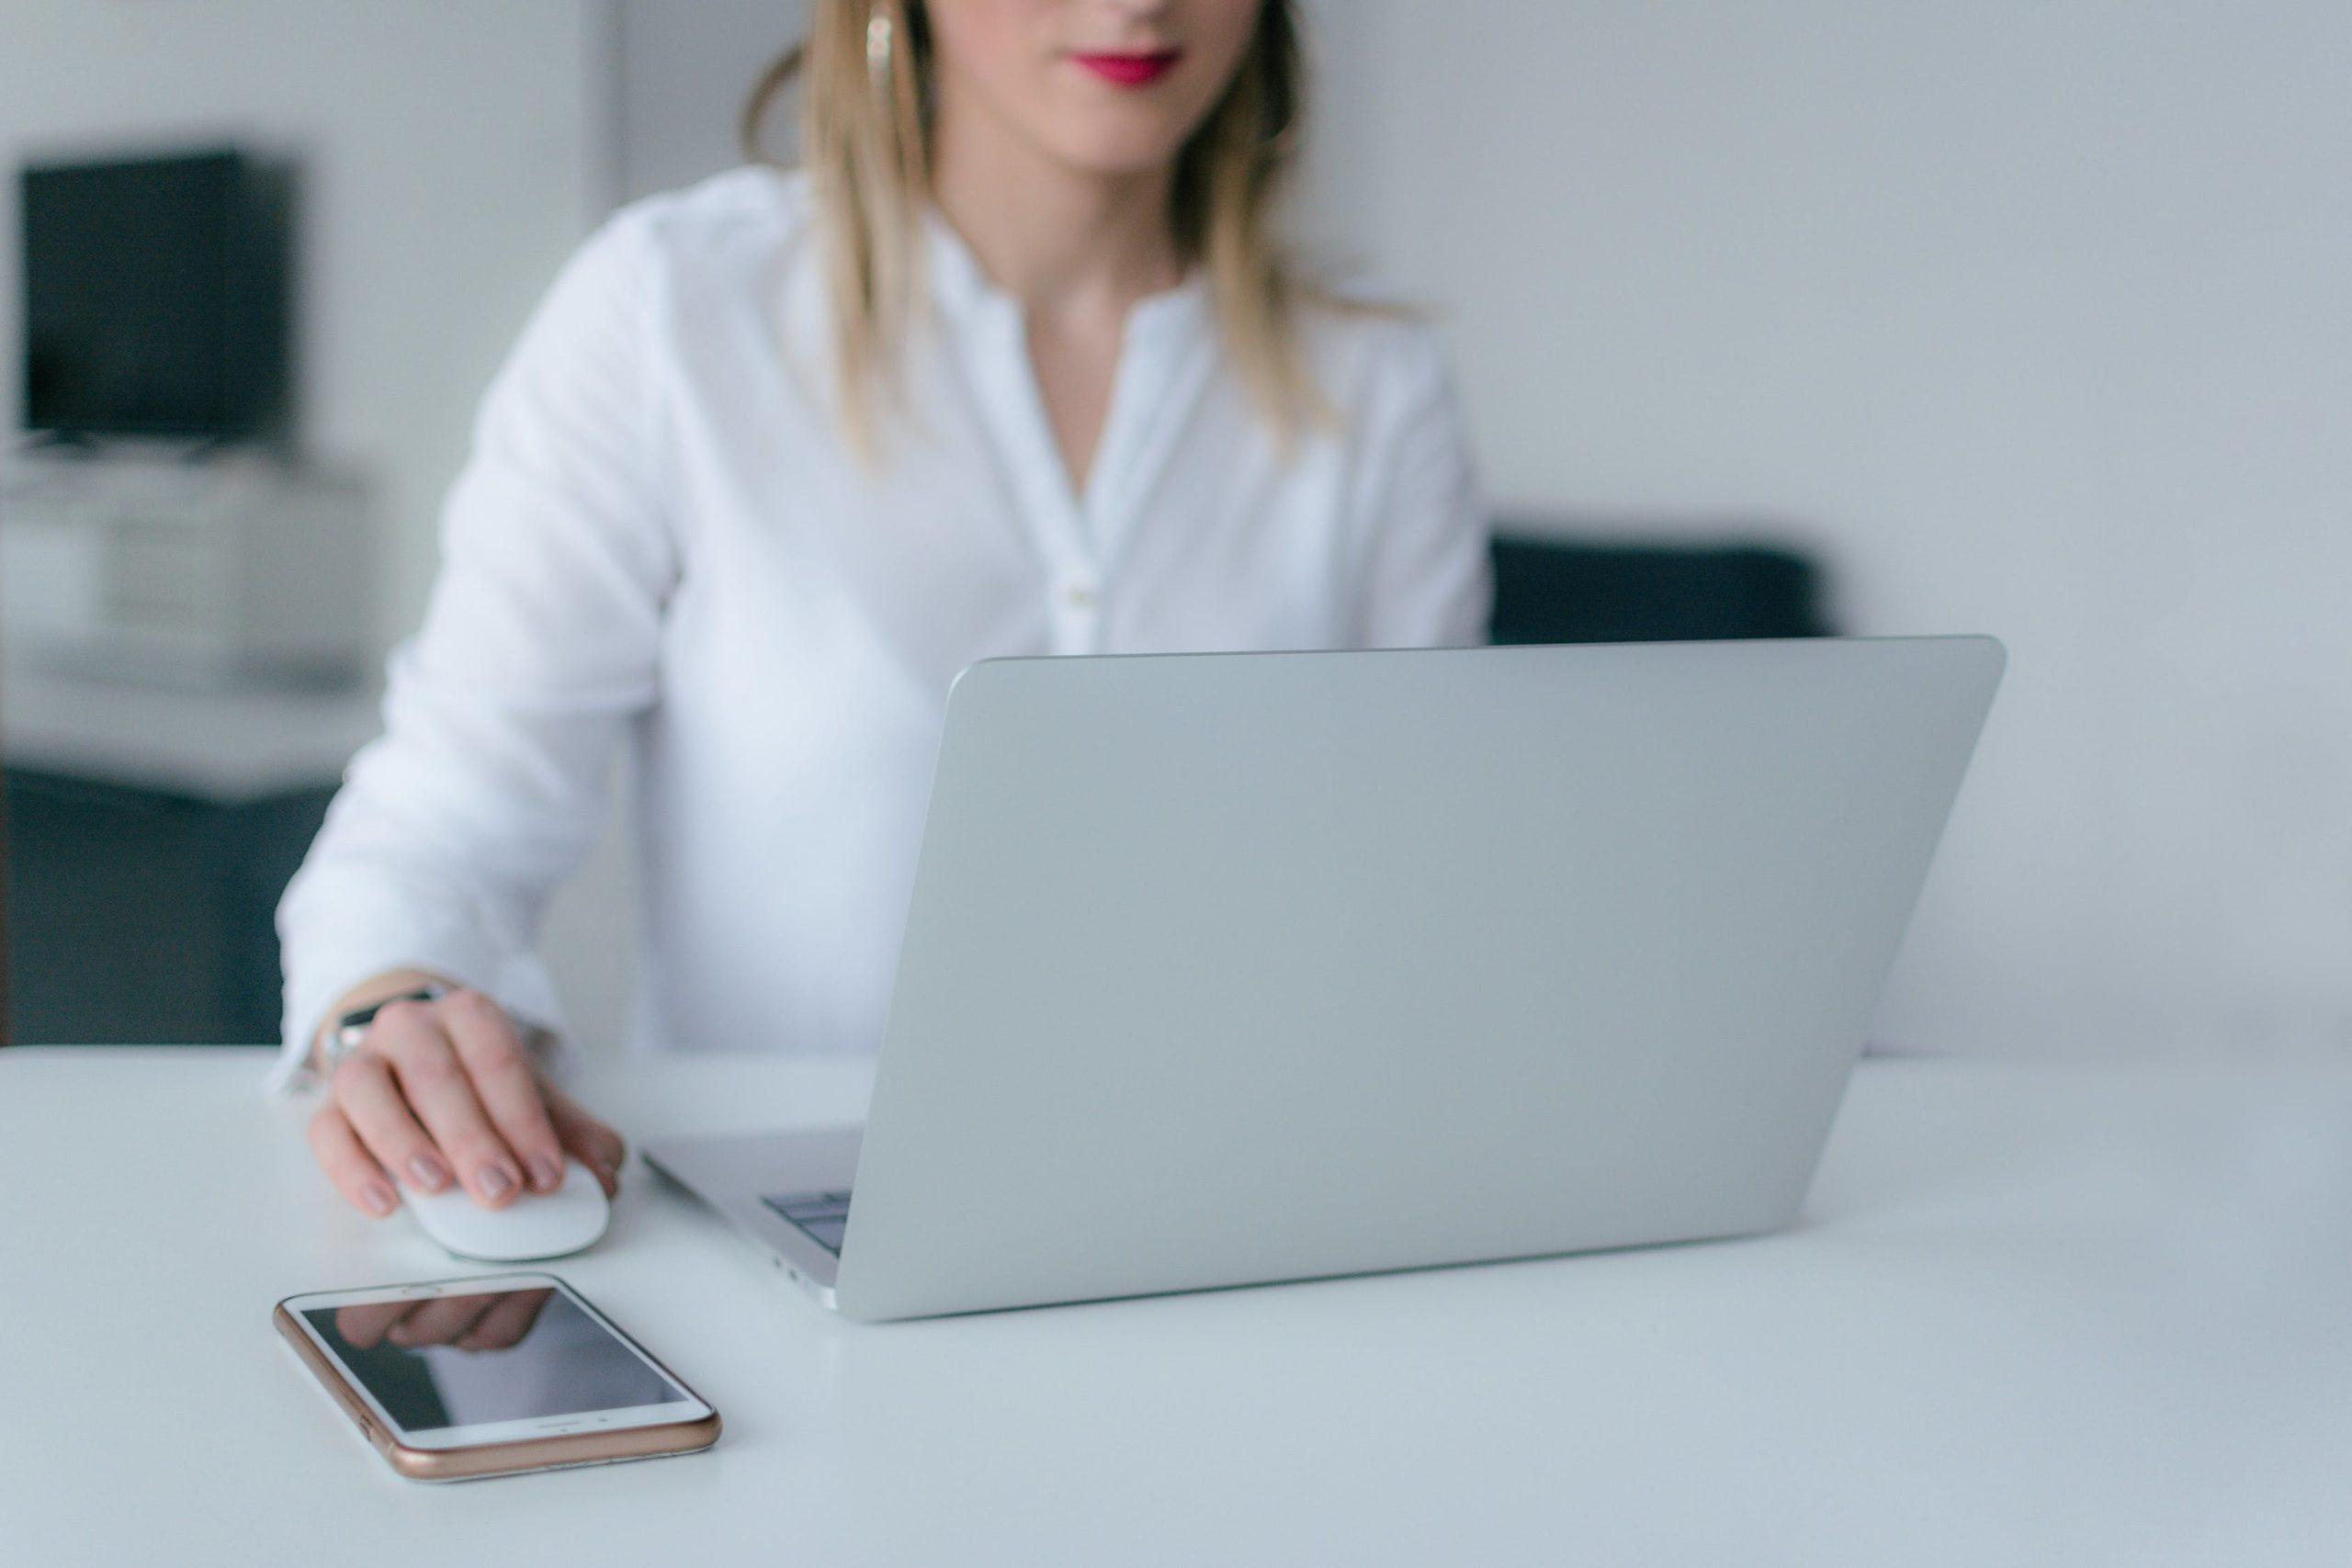 biznes komputer praca